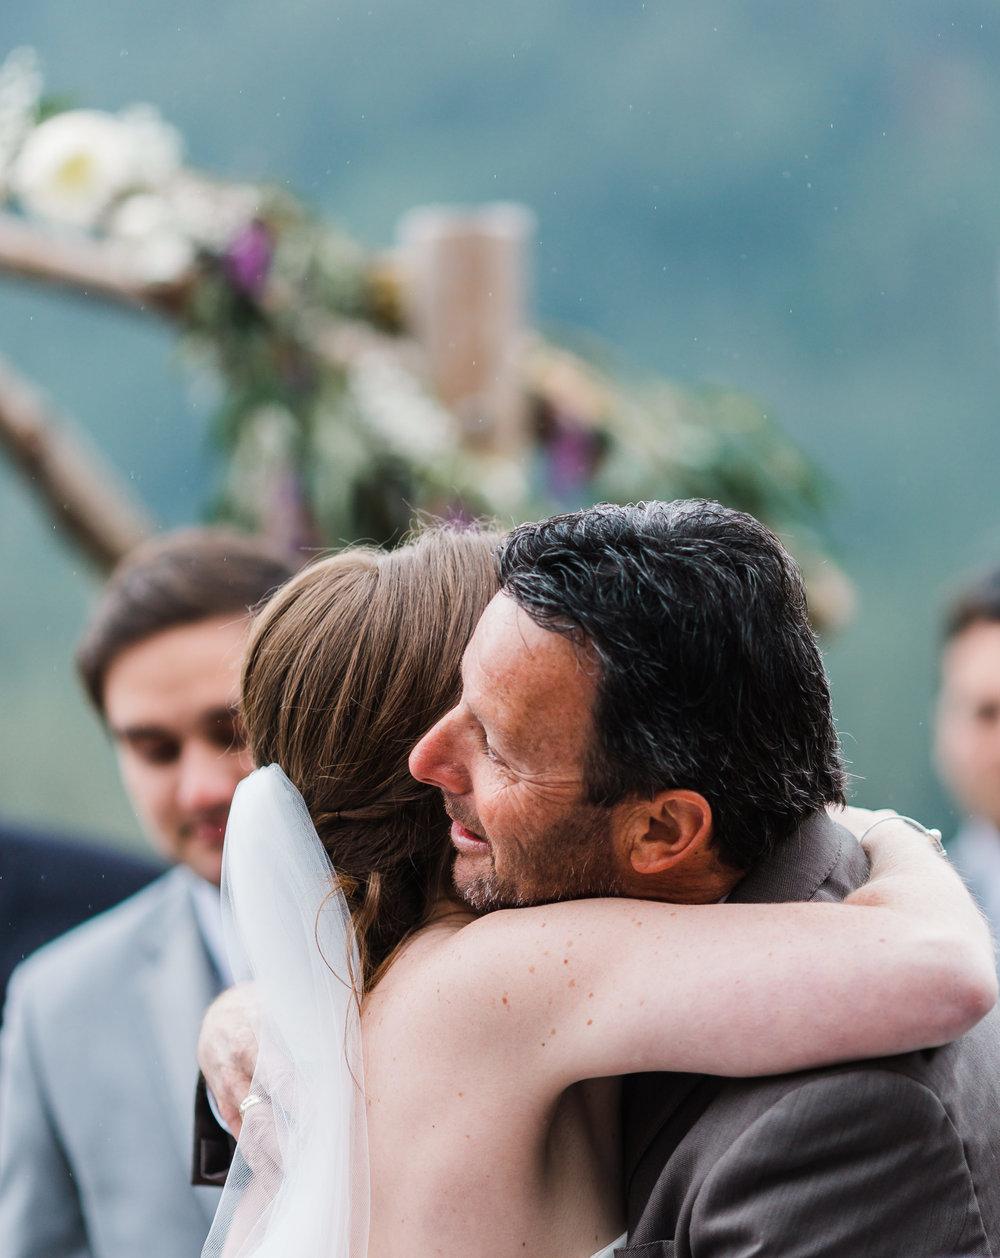 West Coast Wilderness Lodge Wedding Photos - Vancouver Wedding Photographer & Videographer - Sunshine Coast Wedding Photos - Sunshine Coast Wedding Photographer - Jennifer Picard Photography - IMG_0147.jpg